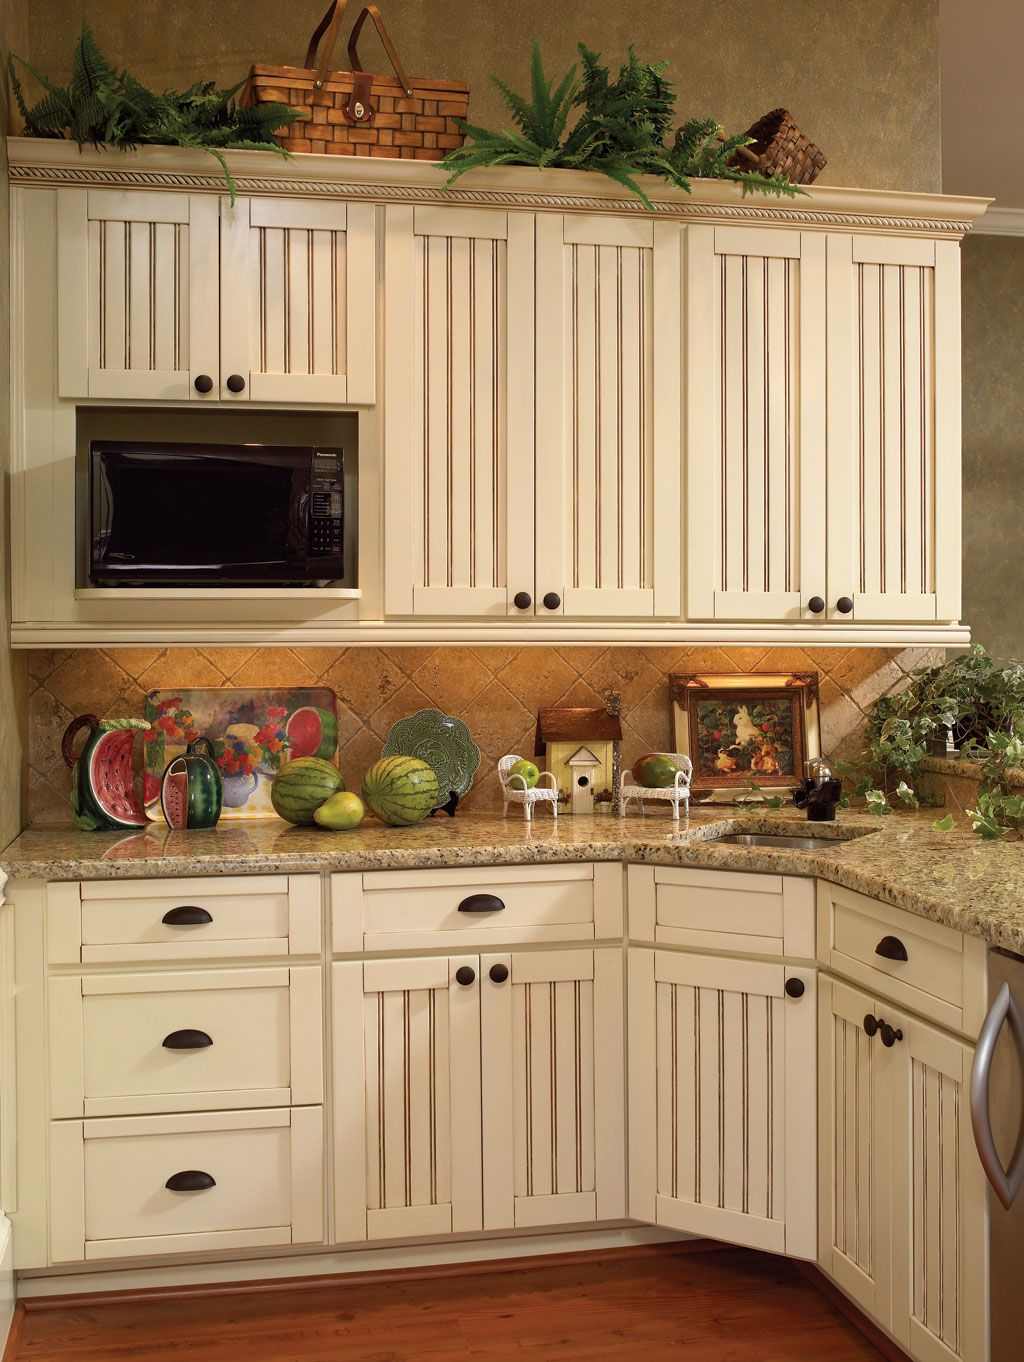 Somerset Maple Vanilla Bean Kitchen Cabinets from Wellborn ...